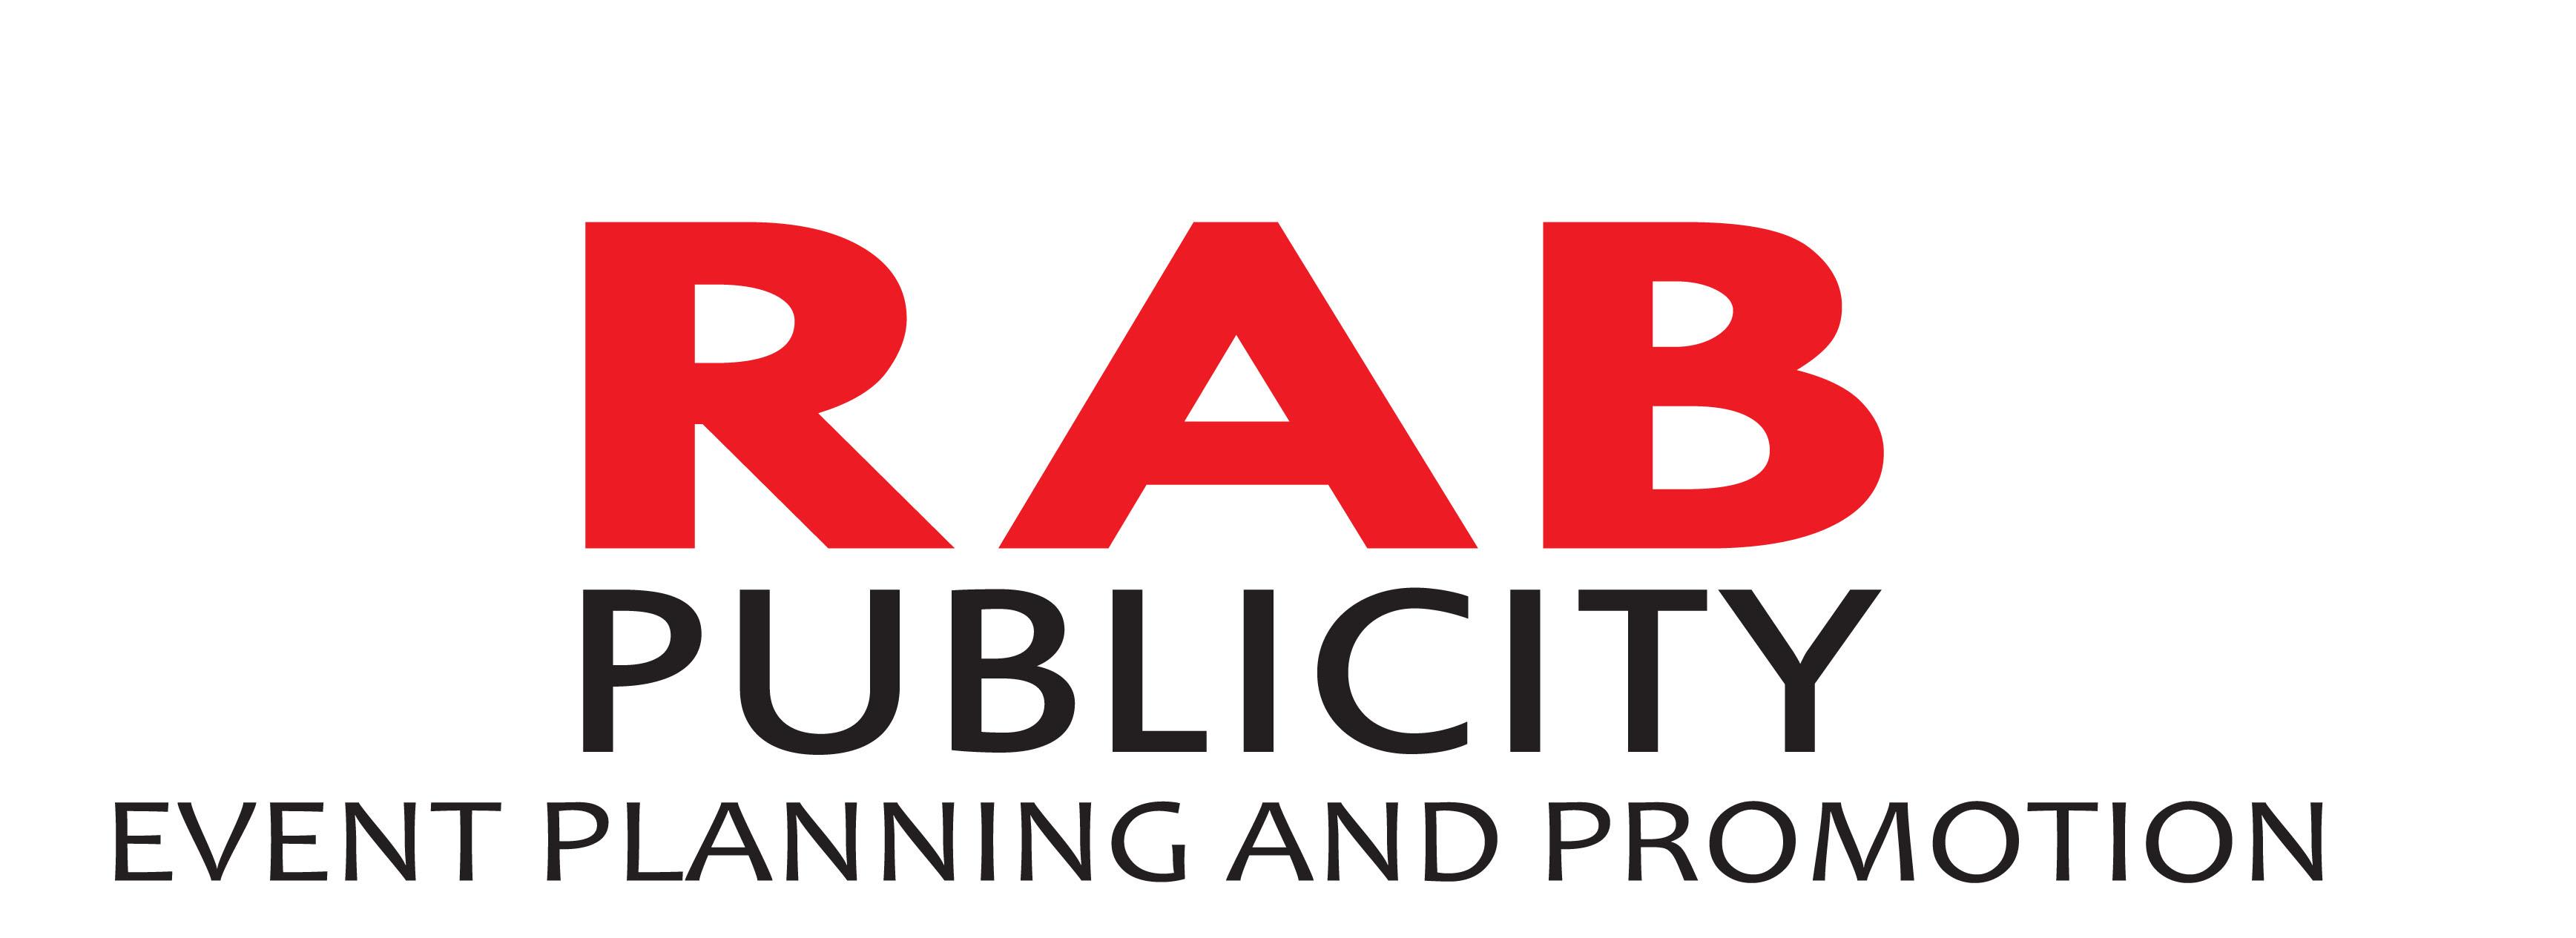 rabpublicity